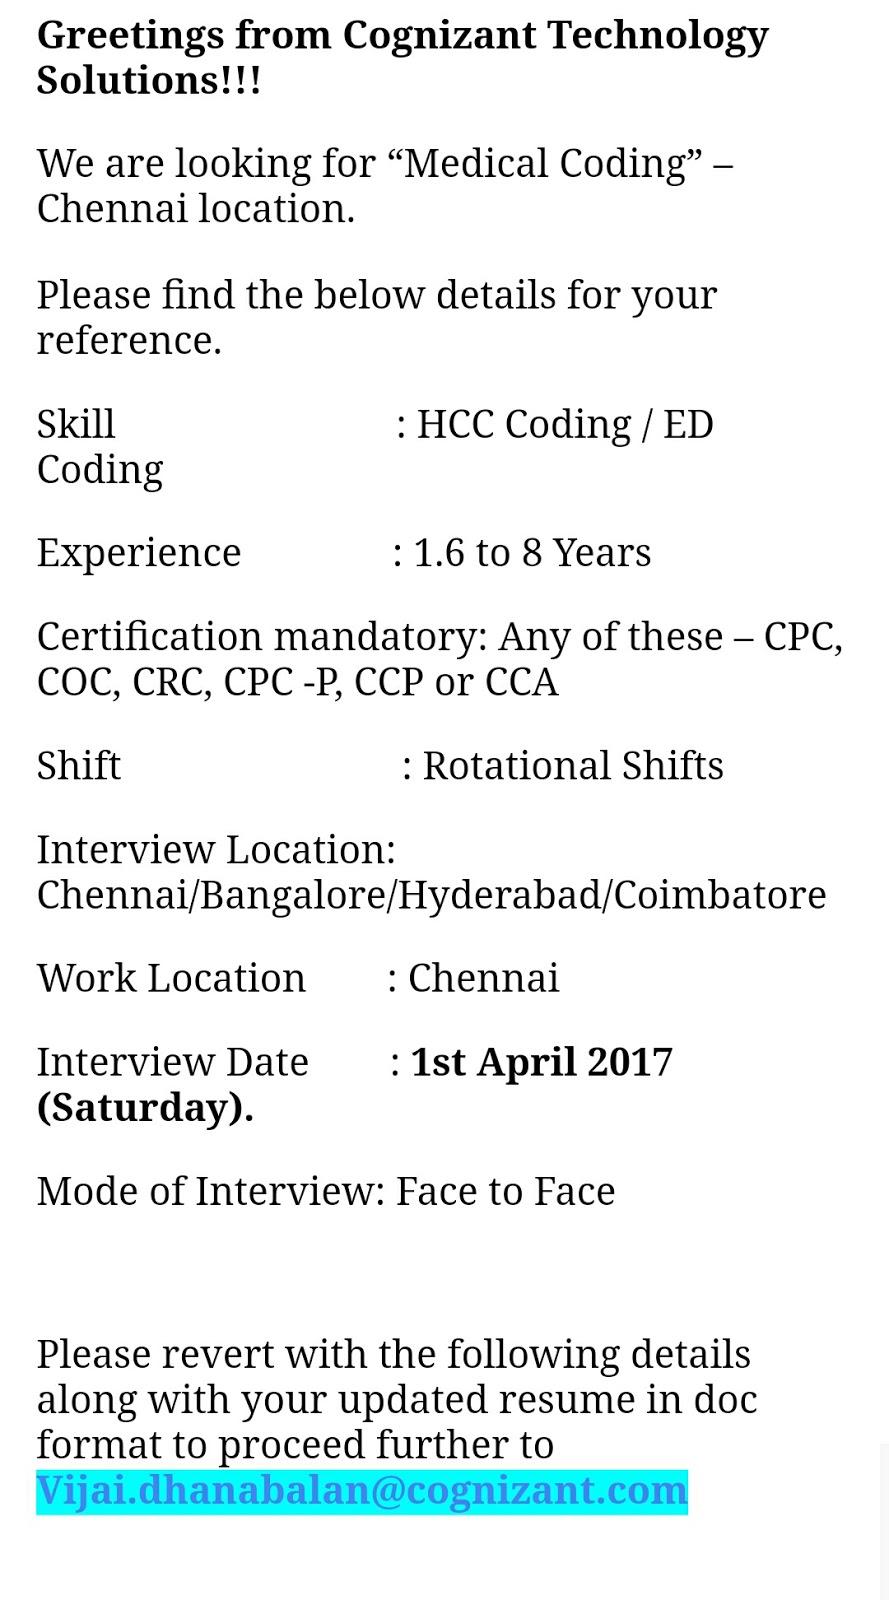 Medical Coding Jobs Cognizant Hiring Certified Hcc Ed Coders